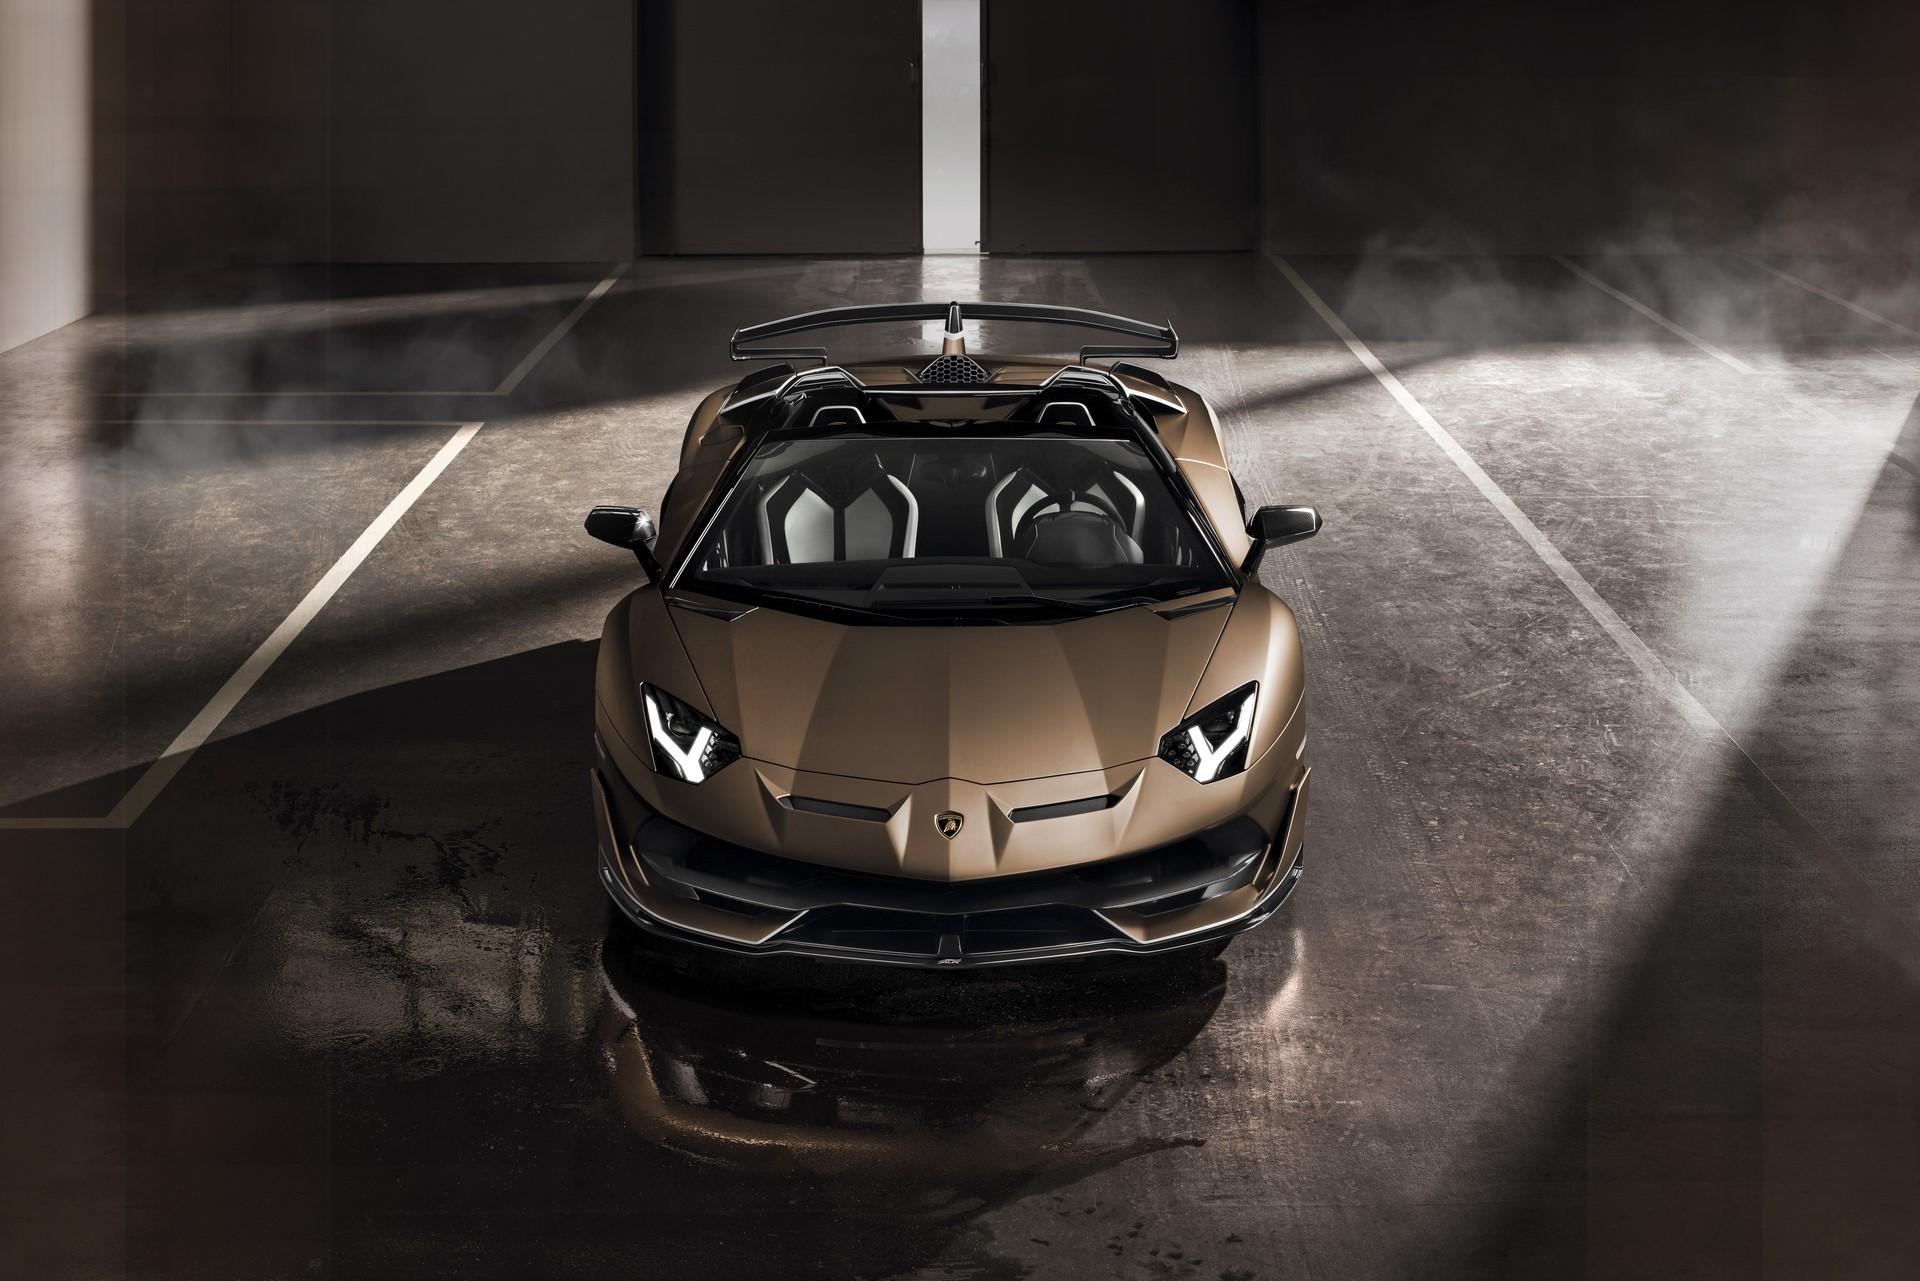 Lamborghini Aventador SVJ Roadster (9)